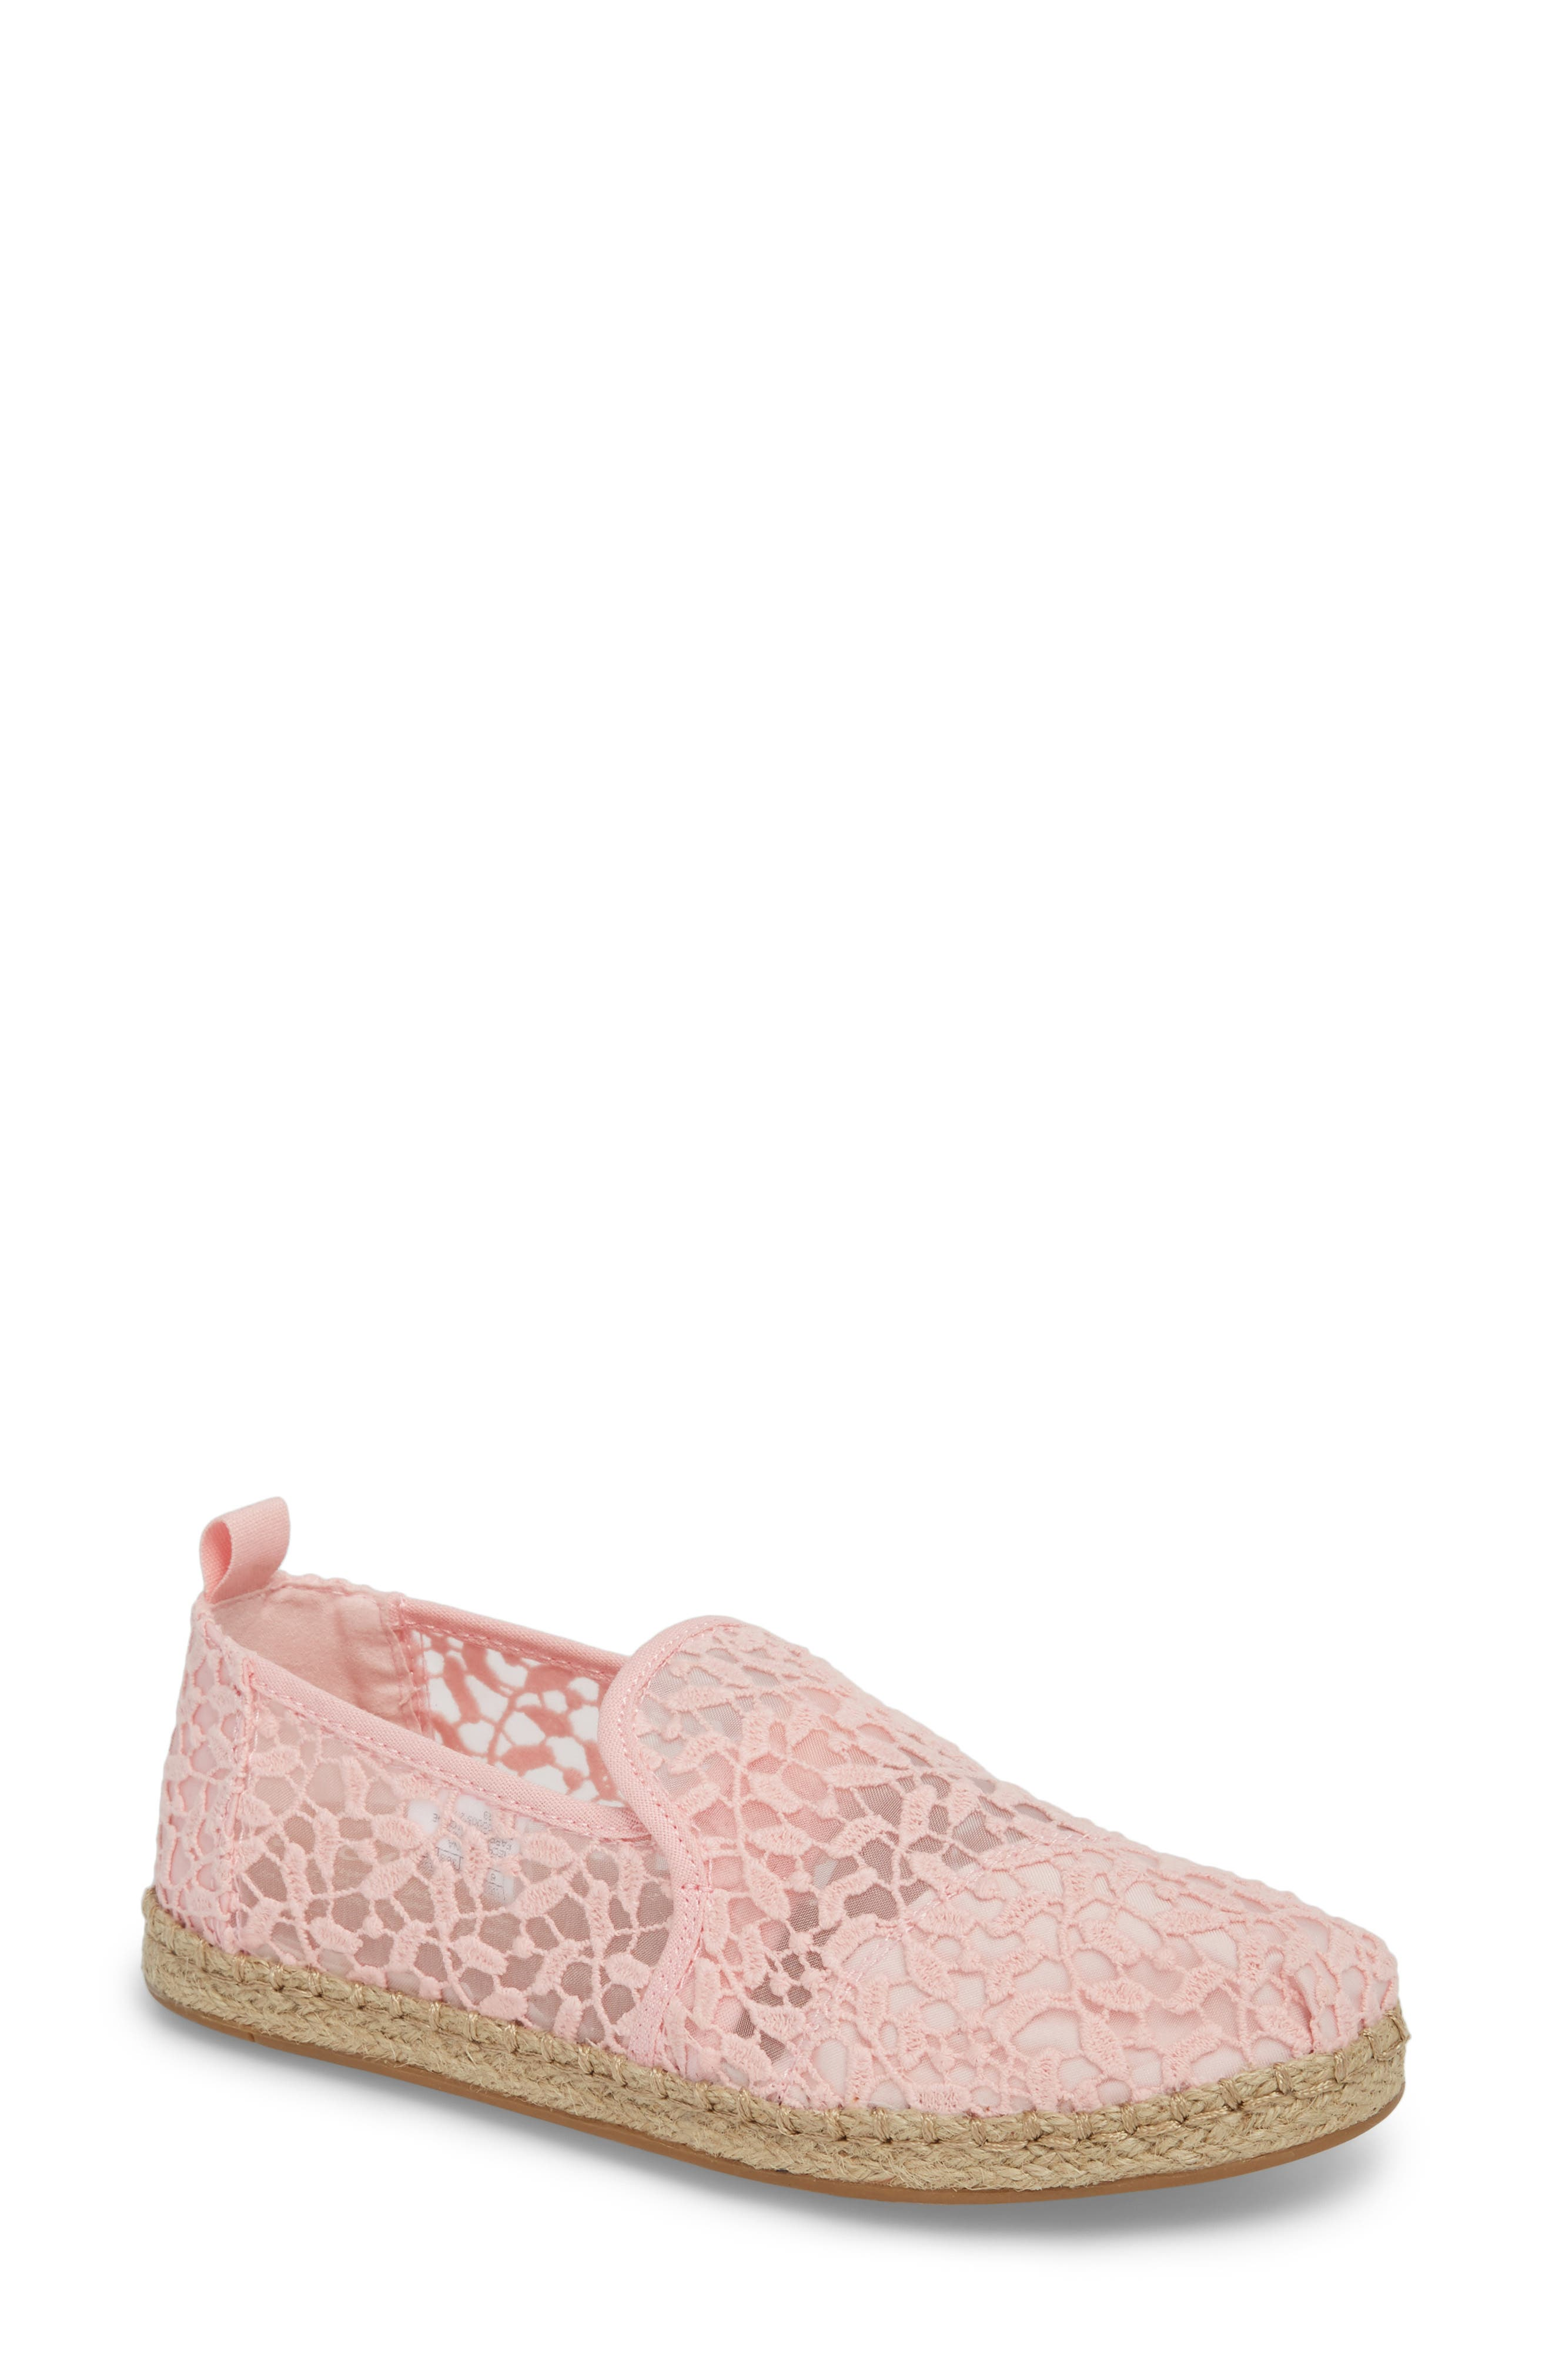 TOMS ALPARGATA - Espadrilles - pink/bloom OdiWBxt